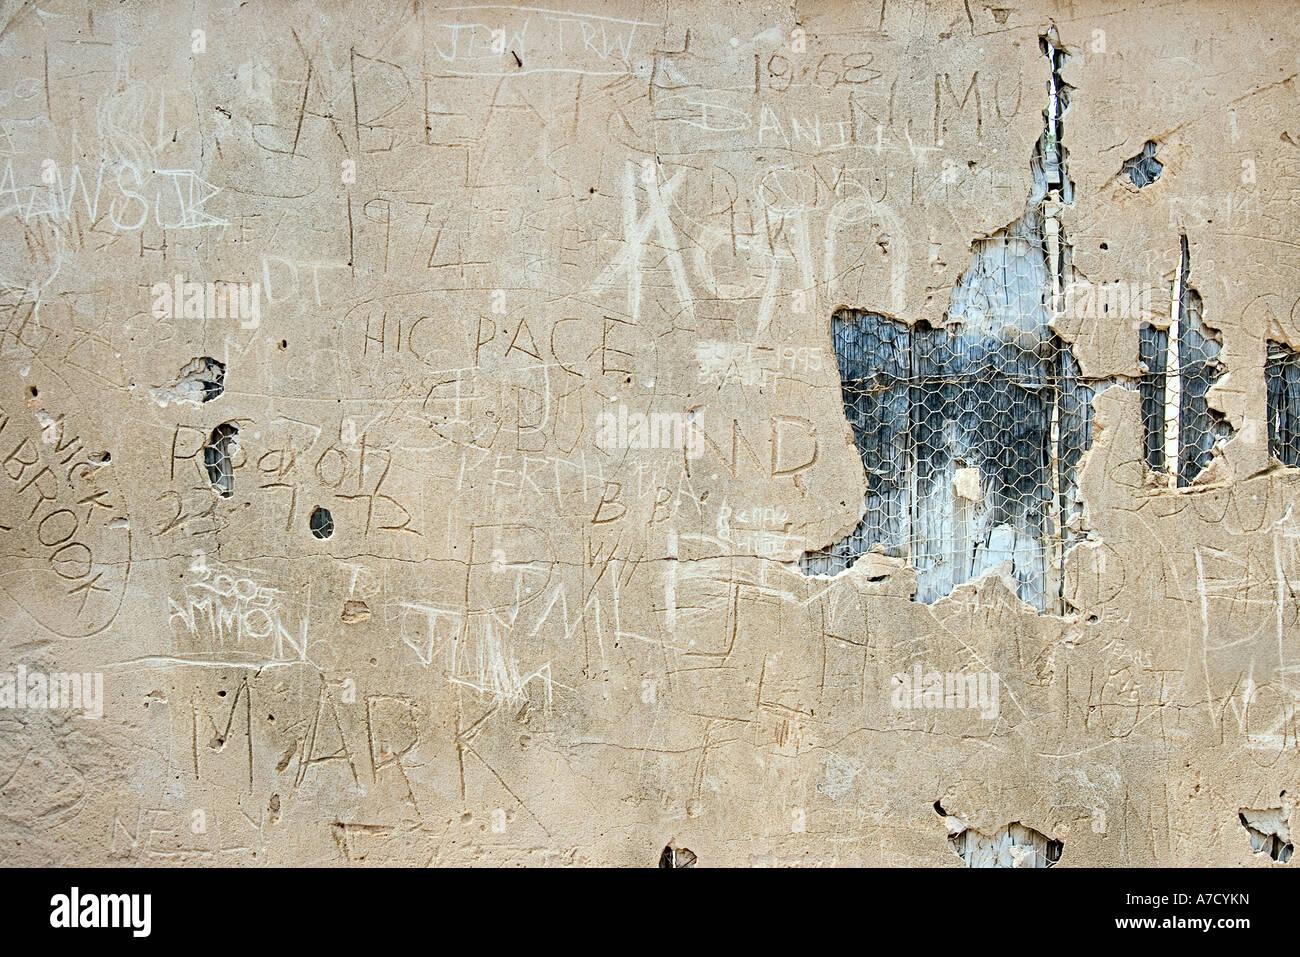 graffitti on ruins of walls - Stock Image